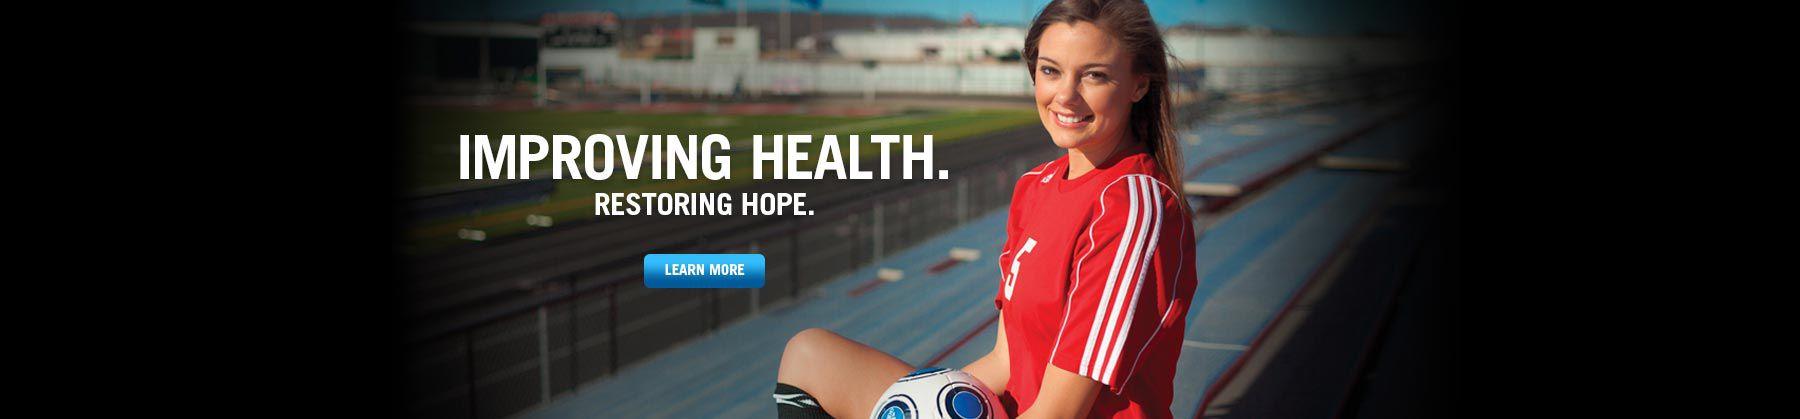 Improving Health. Restoring Hope.